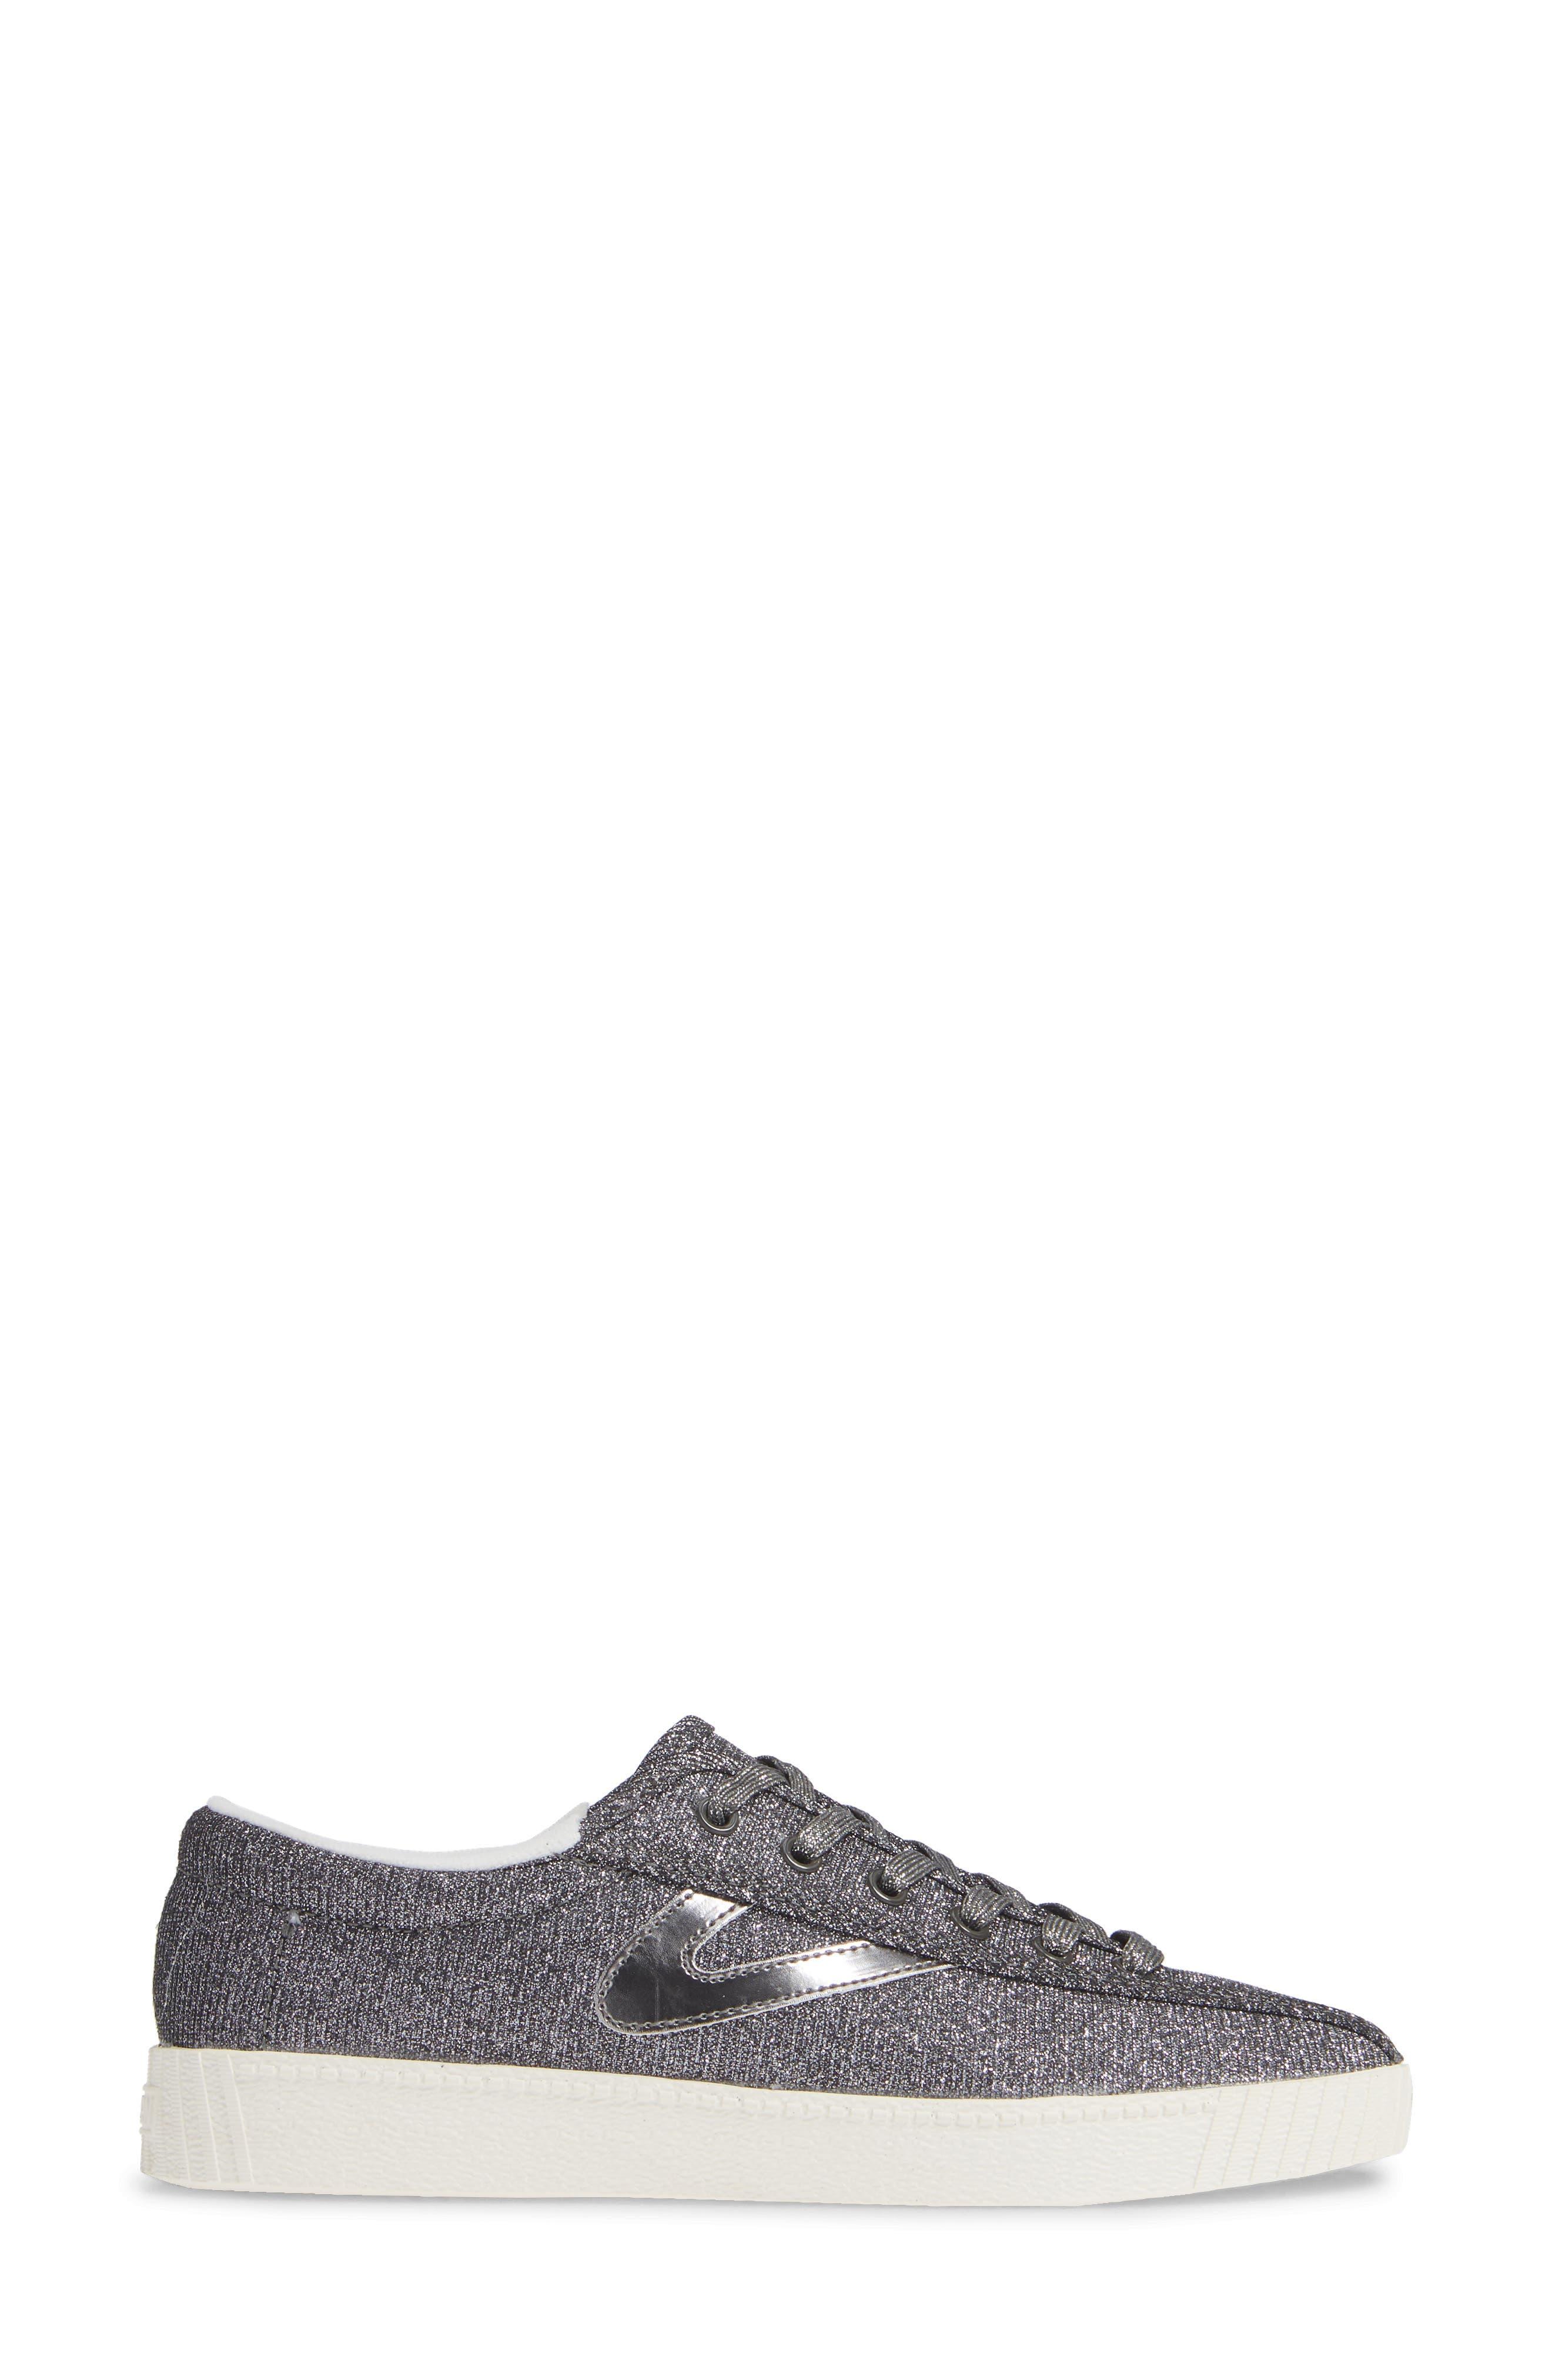 ,                             'Nylite' Sneaker,                             Alternate thumbnail 3, color,                             022